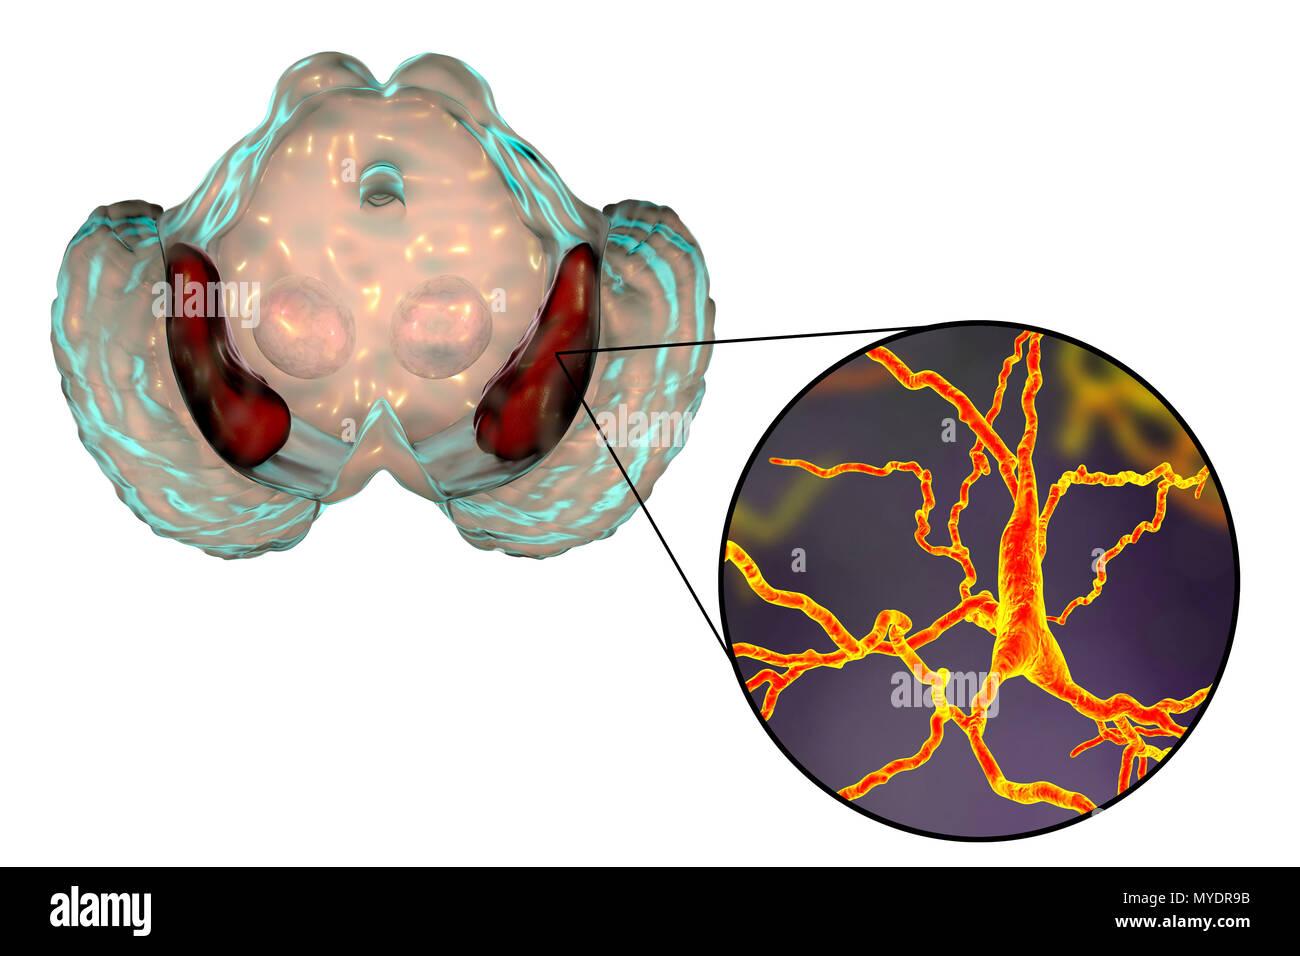 Substantia nigra. Computer zeigt eine gesunde substantia Nigra aus ...